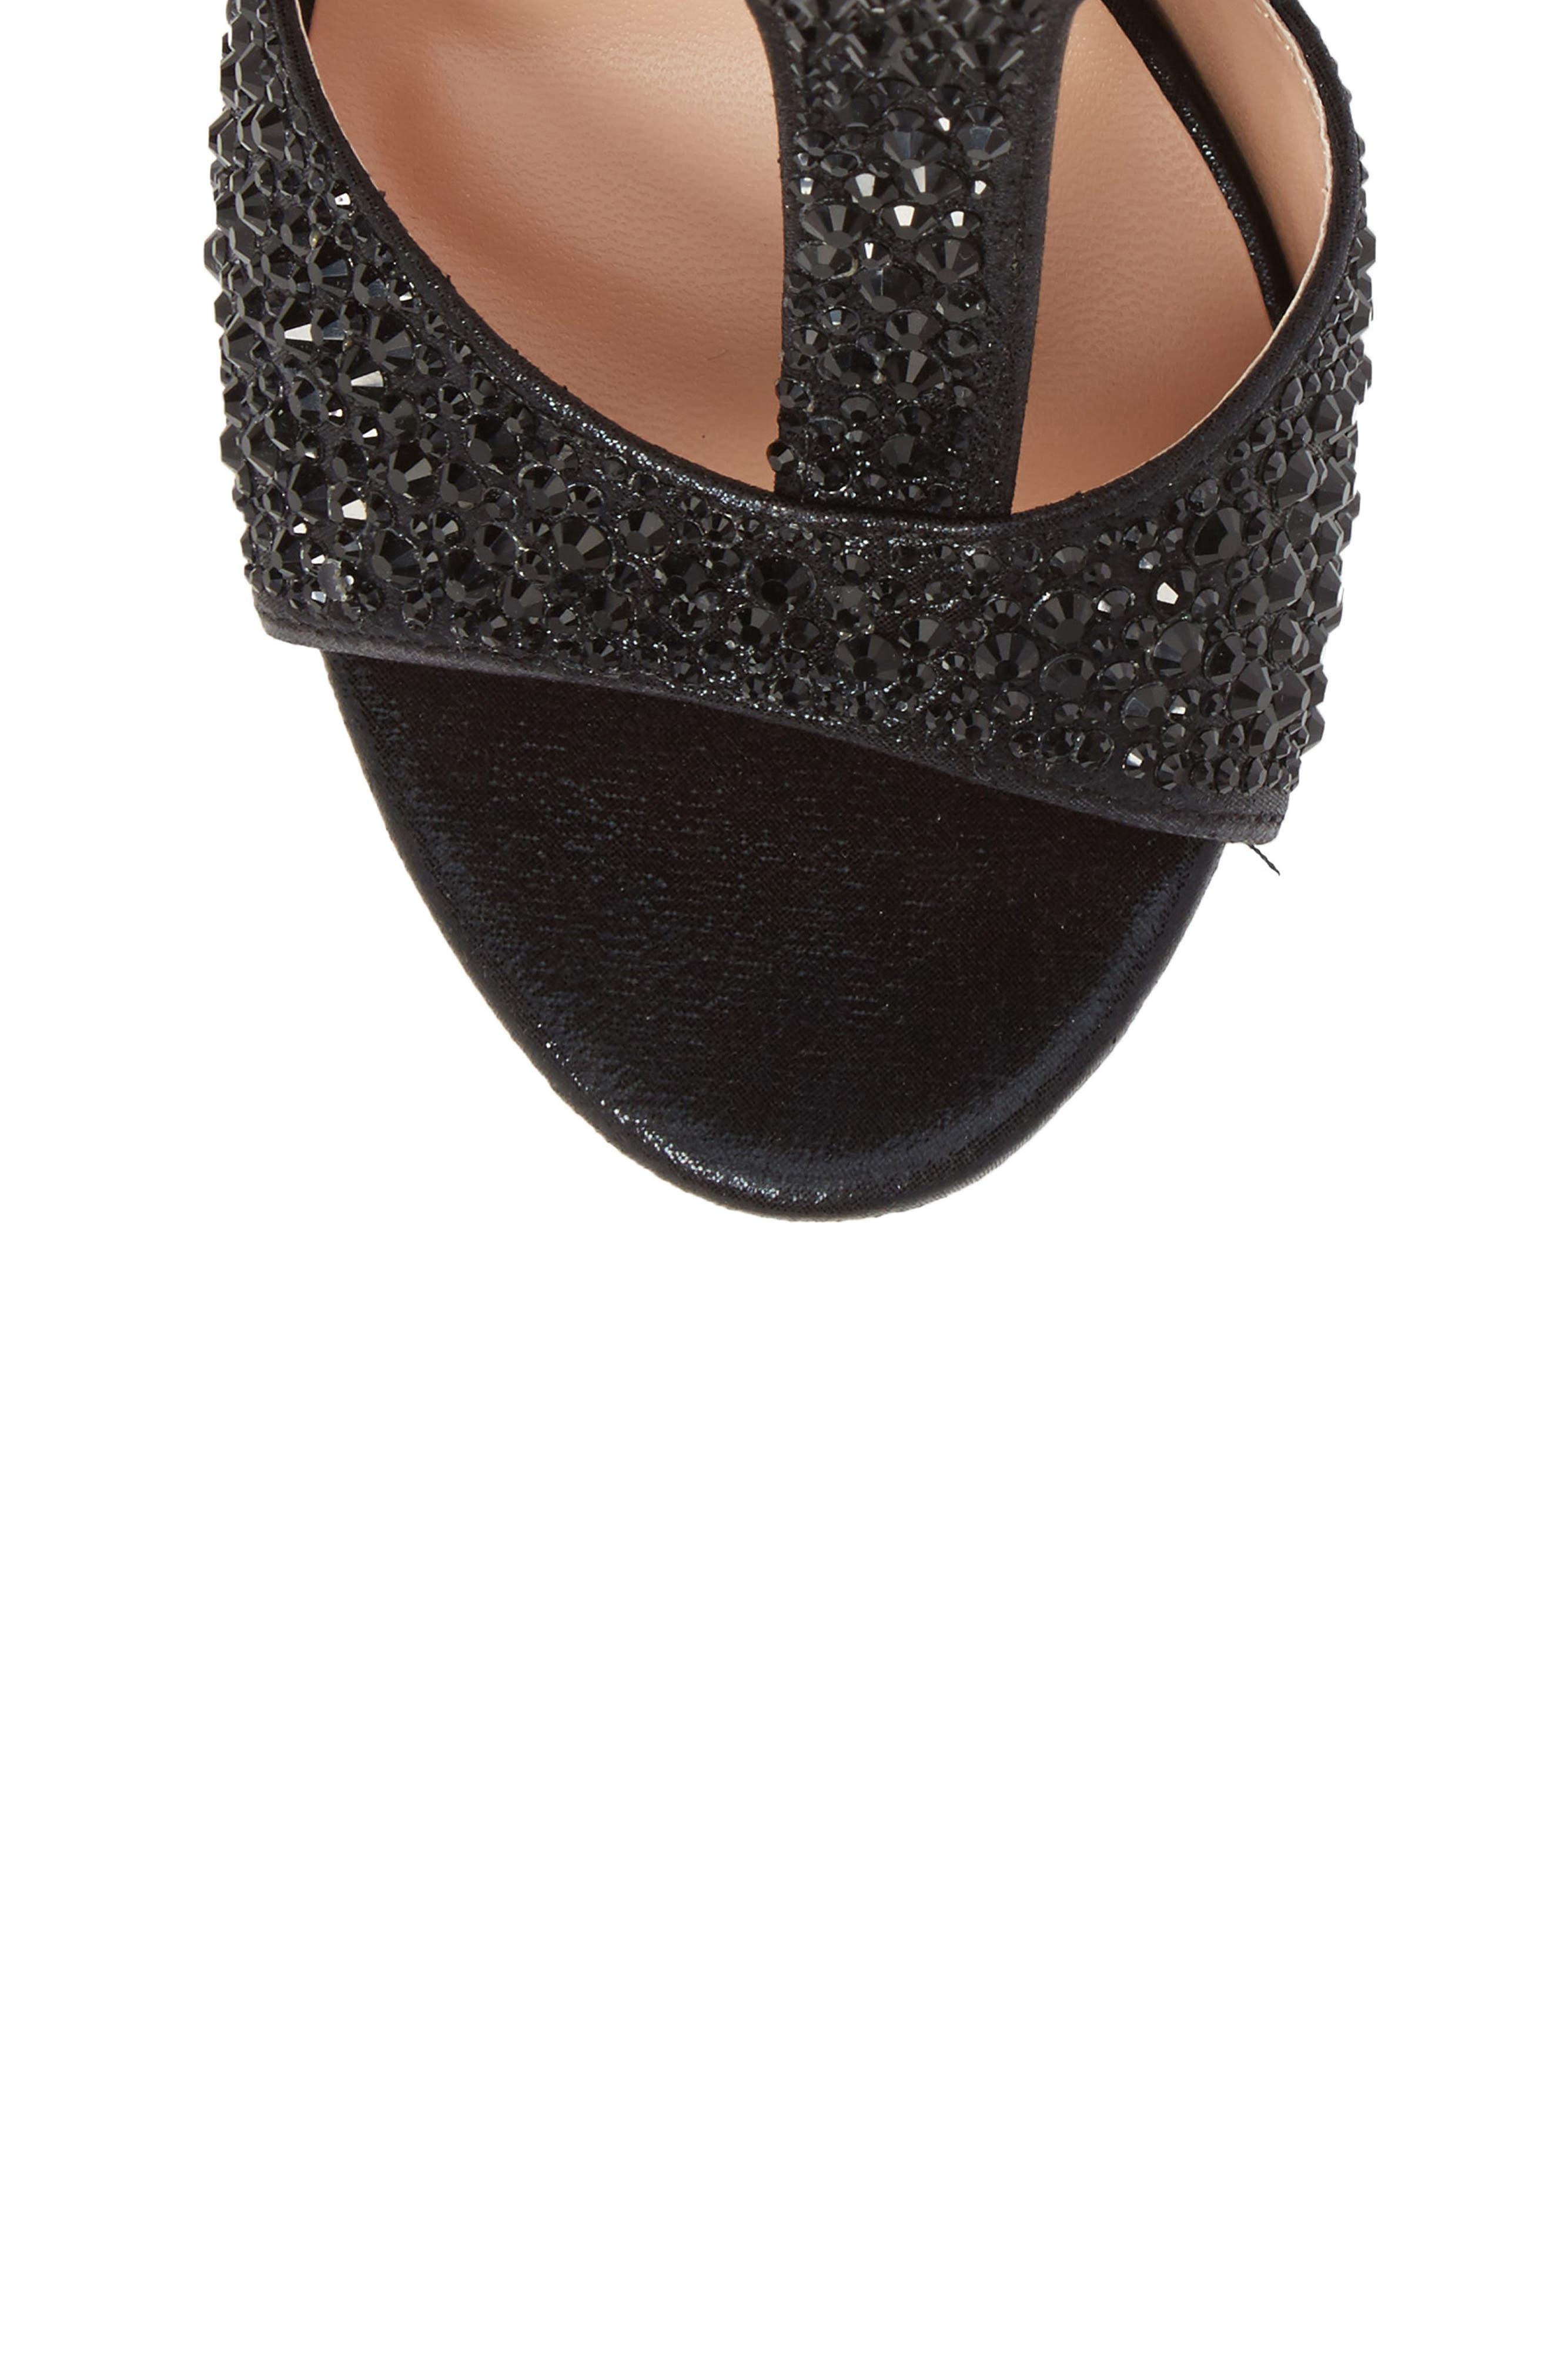 LAUREN LORRAINE, Ina Crystal Embellished Sandal, Alternate thumbnail 5, color, 001